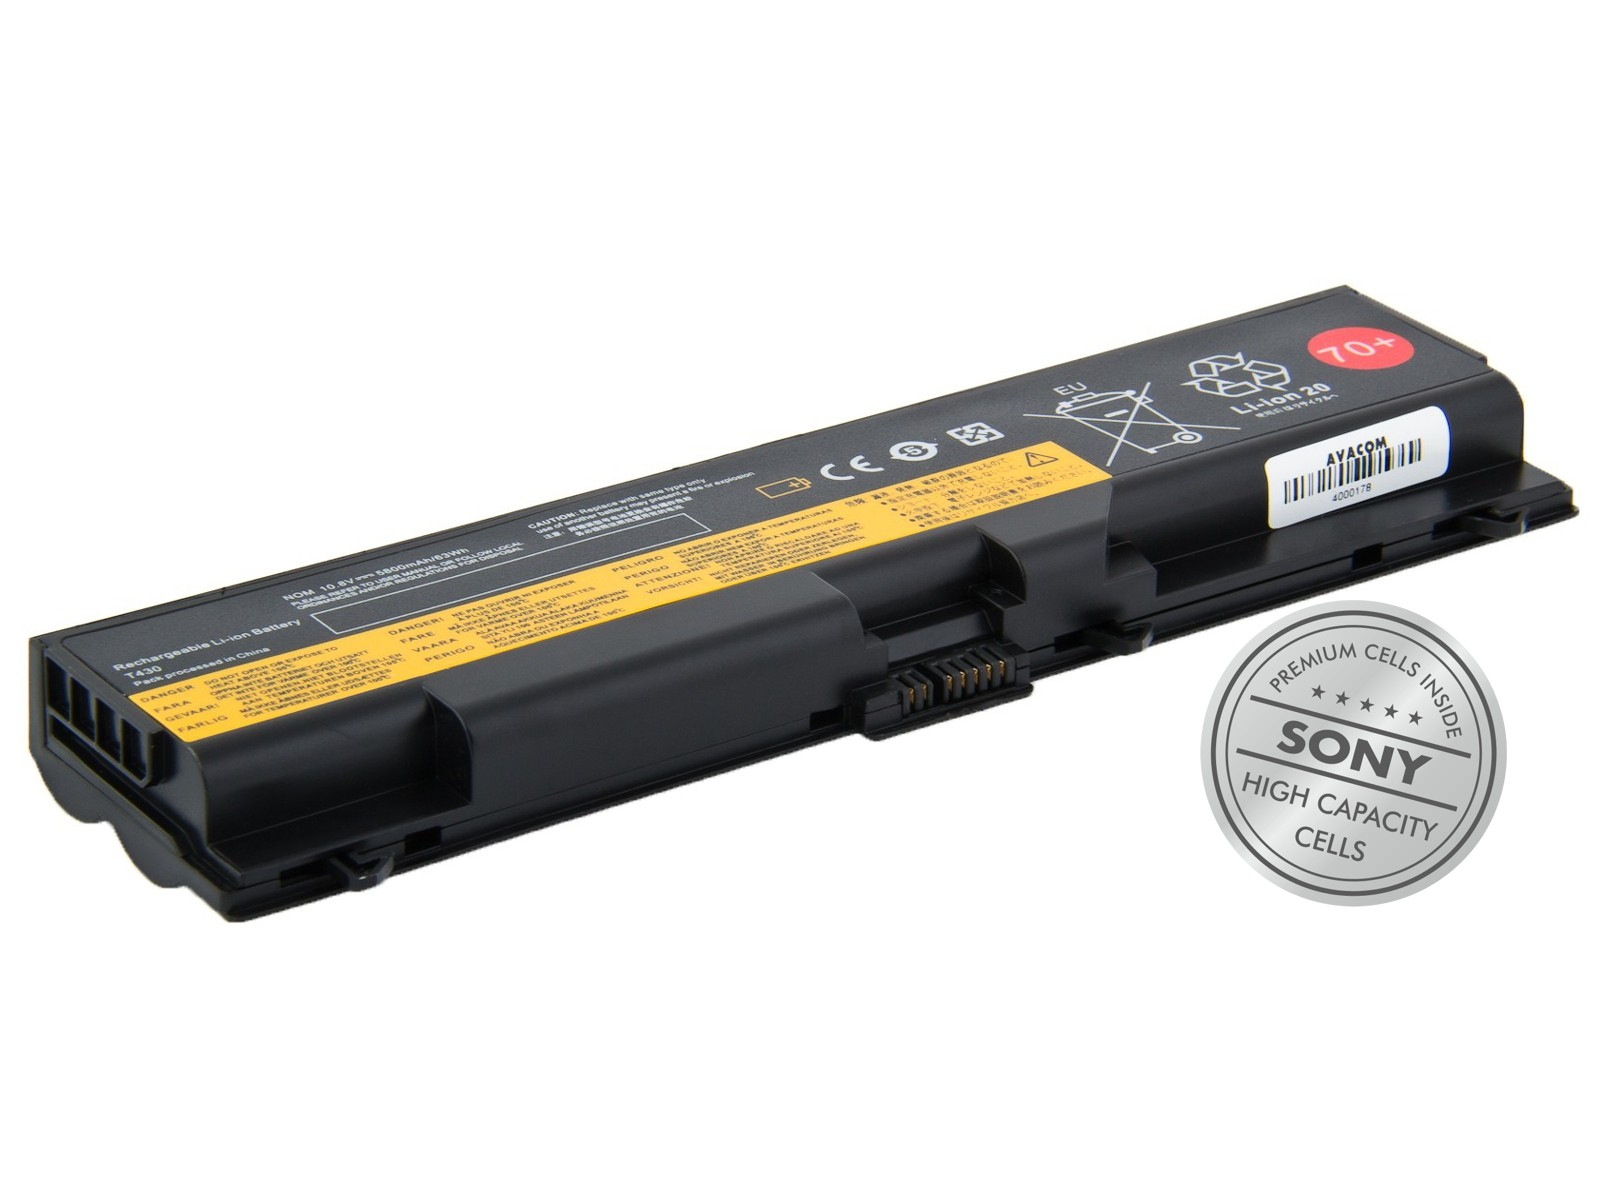 Baterie AVACOM NOLE-T430-S29 pro Lenovo ThinkPad T430 Li-Ion 10,8V 5800mAh/63Wh